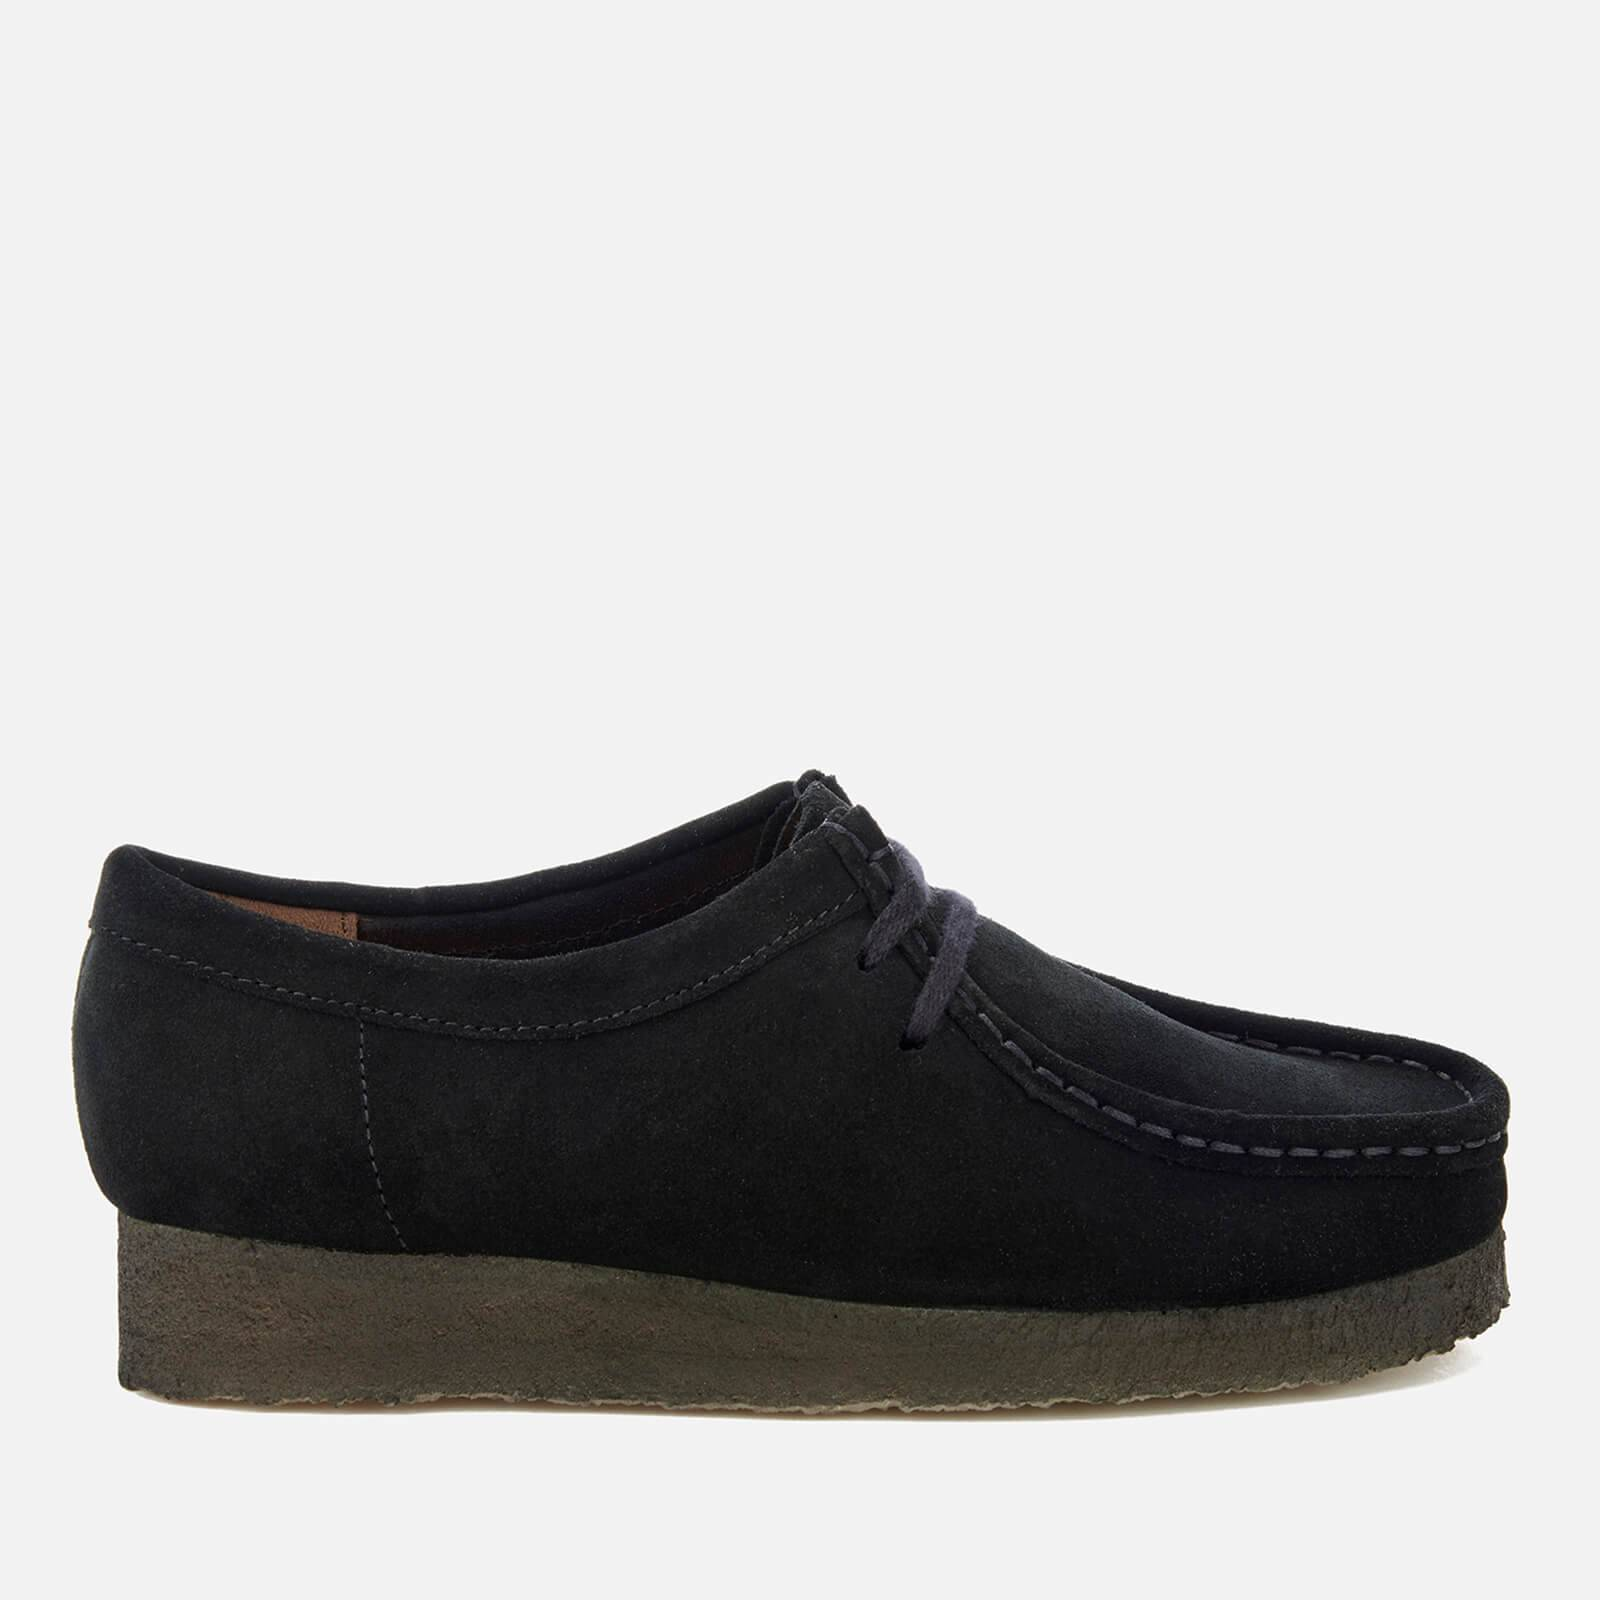 Clarks Originals Women's Wallabee Shoes - Black Suede - UK 4 - Black